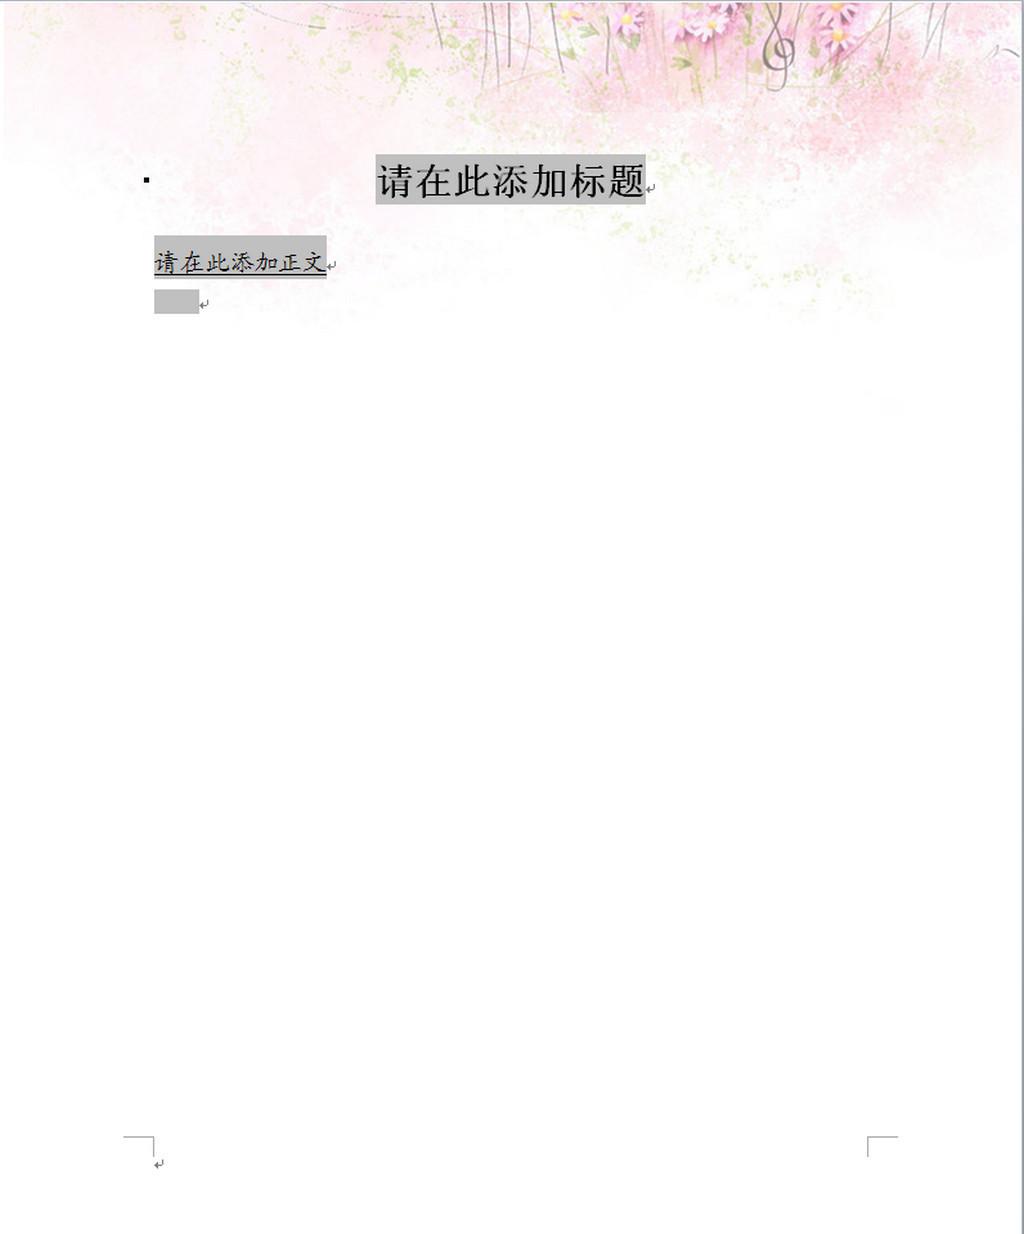 word信笺模板